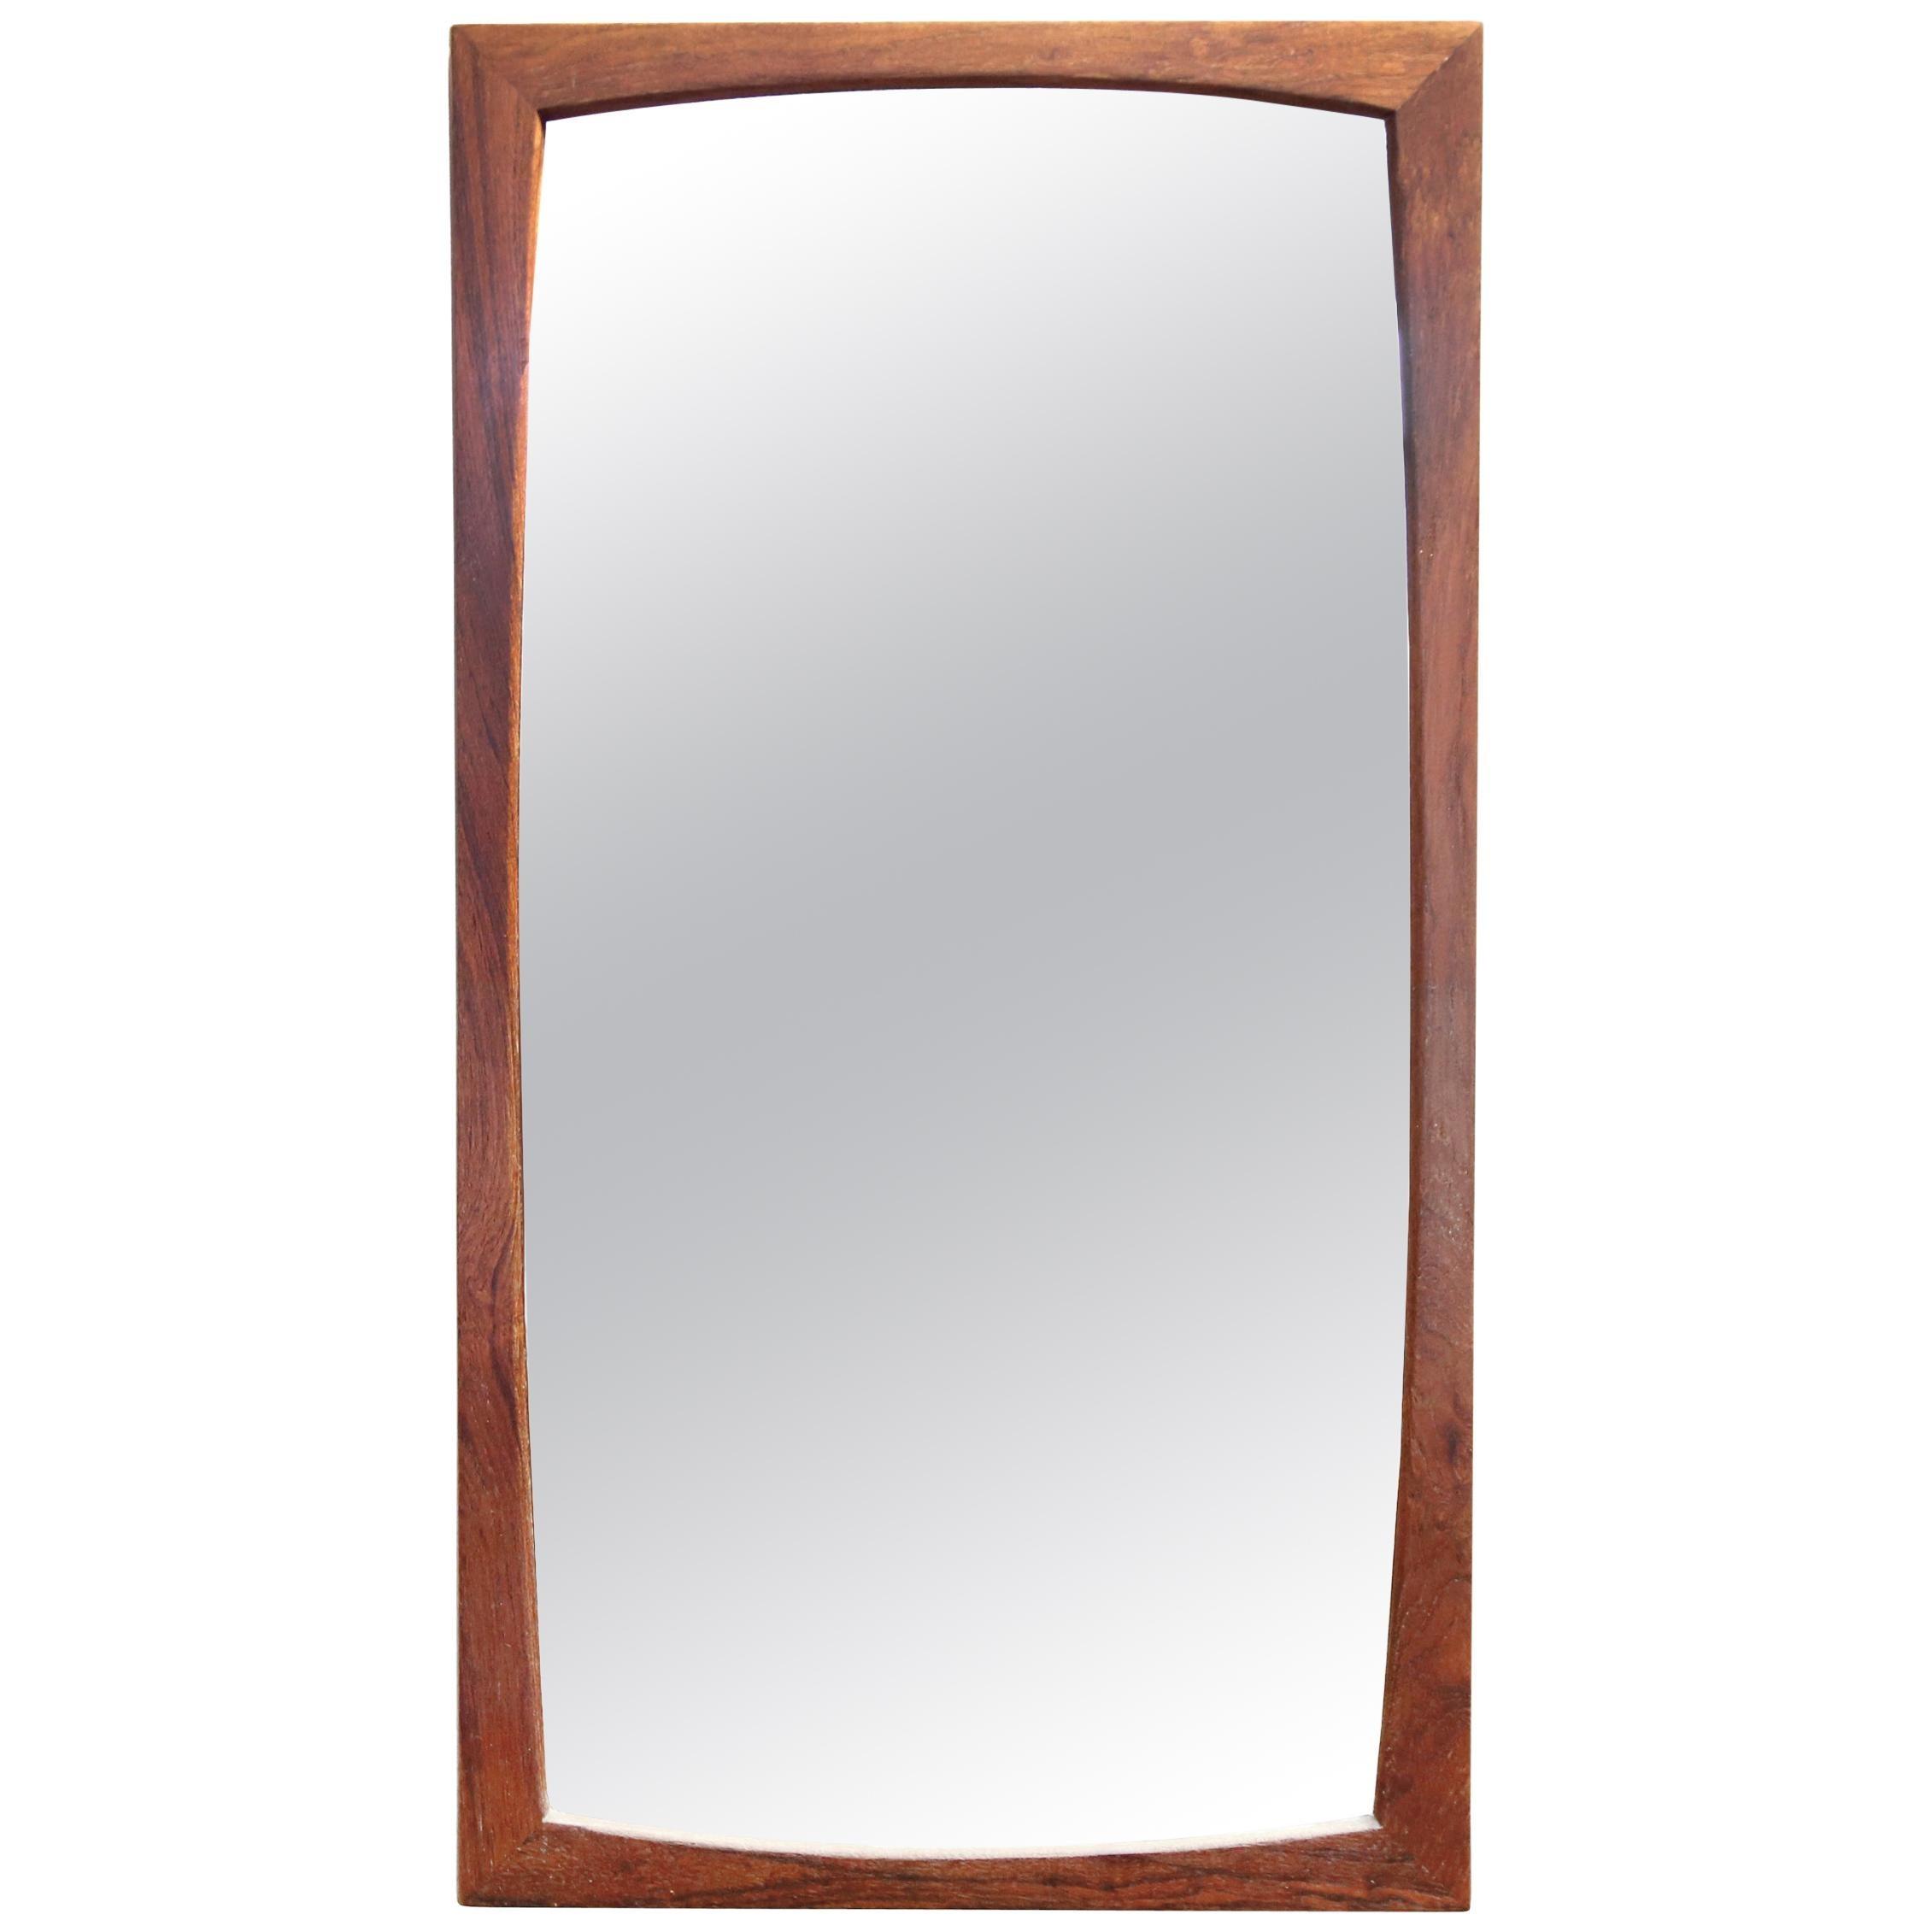 Teak Midcentury Mirror by Kai Kristiansen for Aksel Kjærsgaard Model No. 103